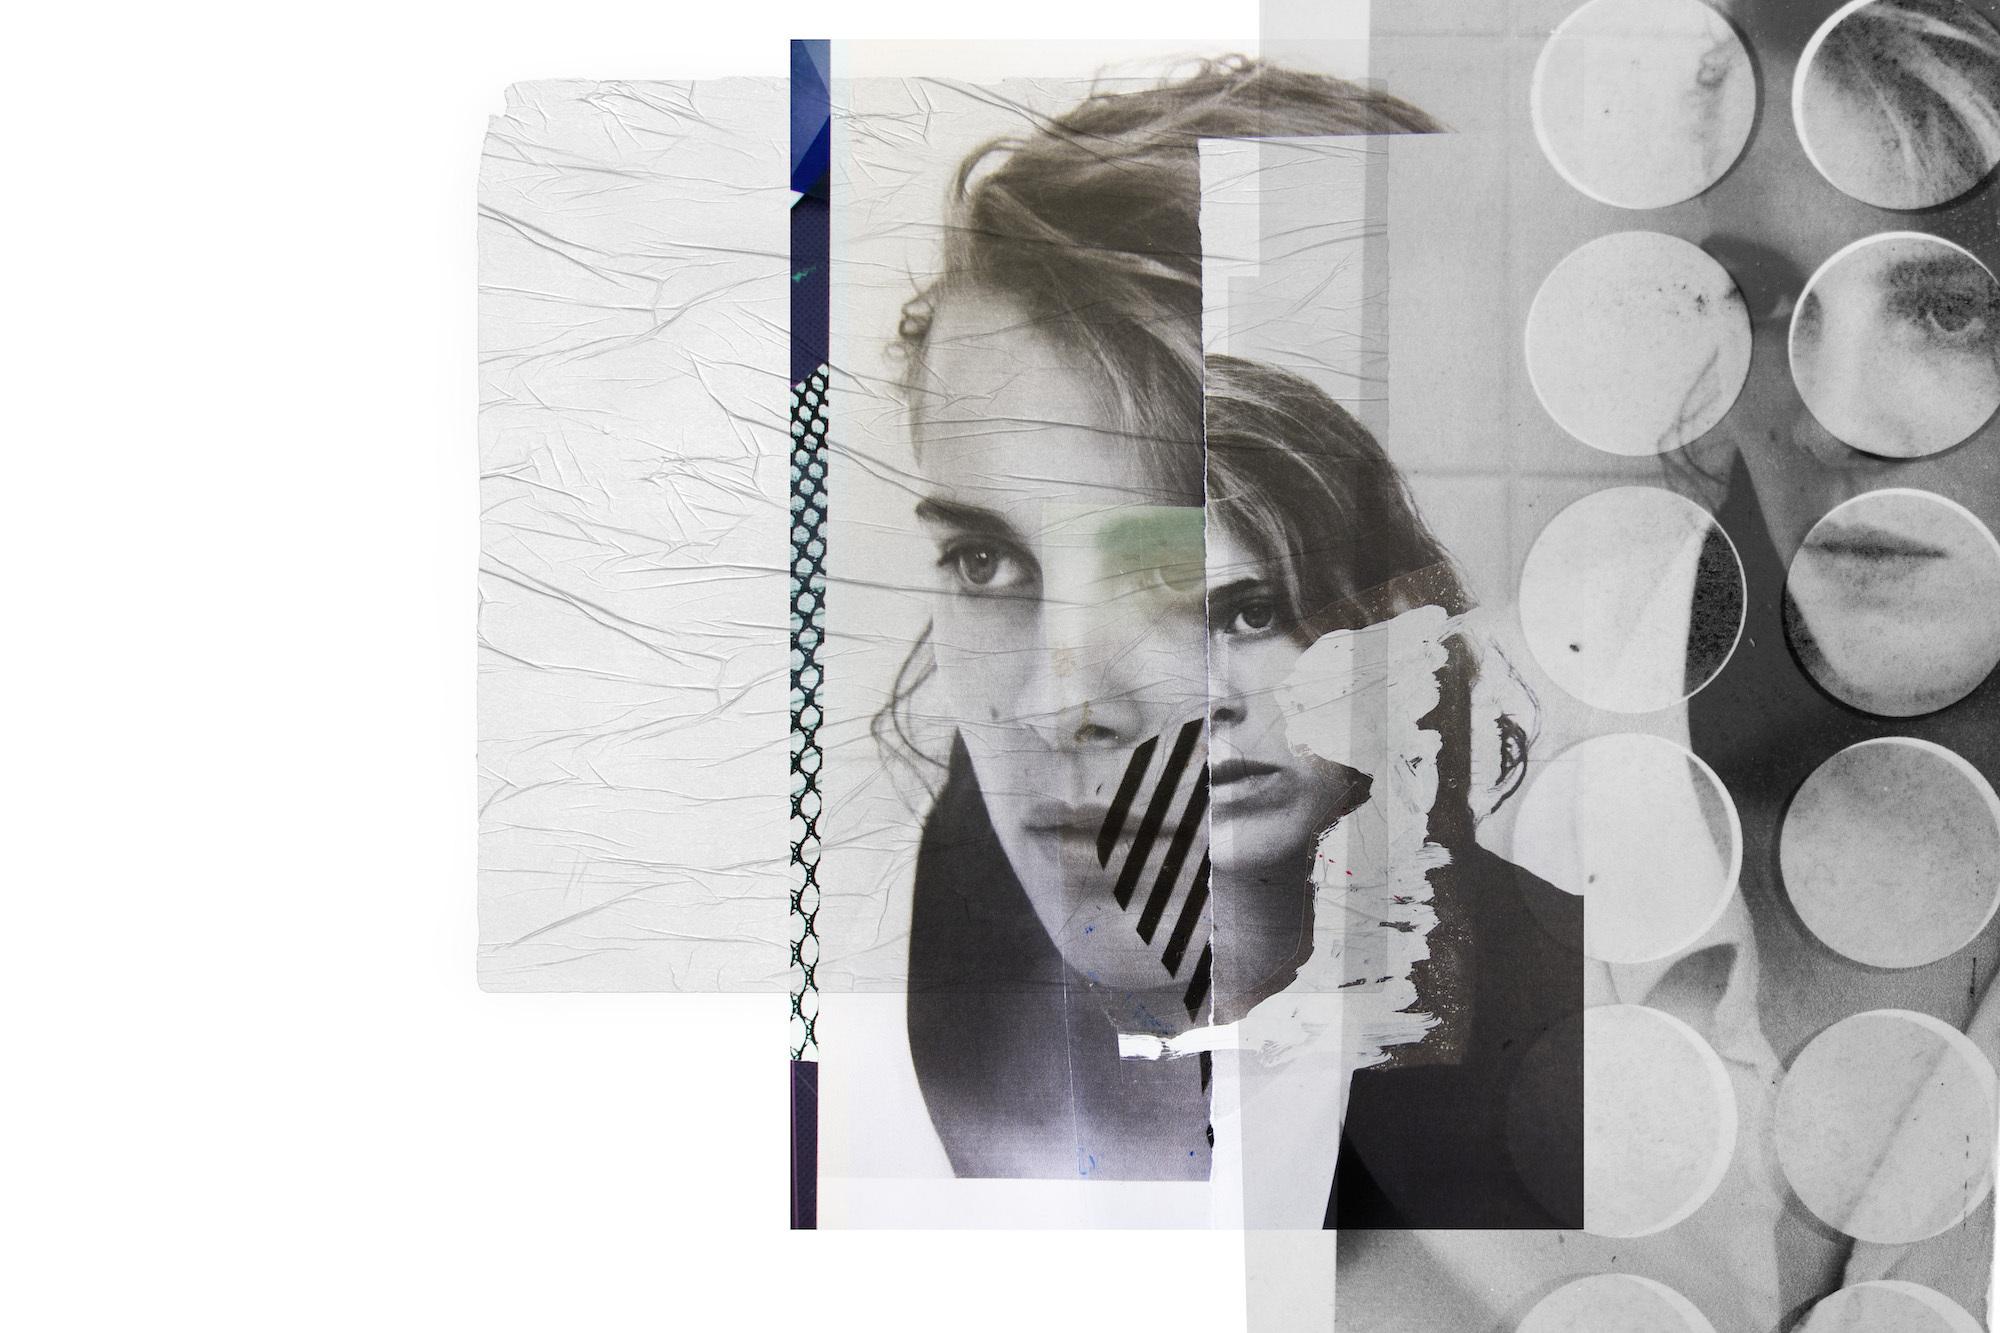 Cover Girl: Marika Hackman